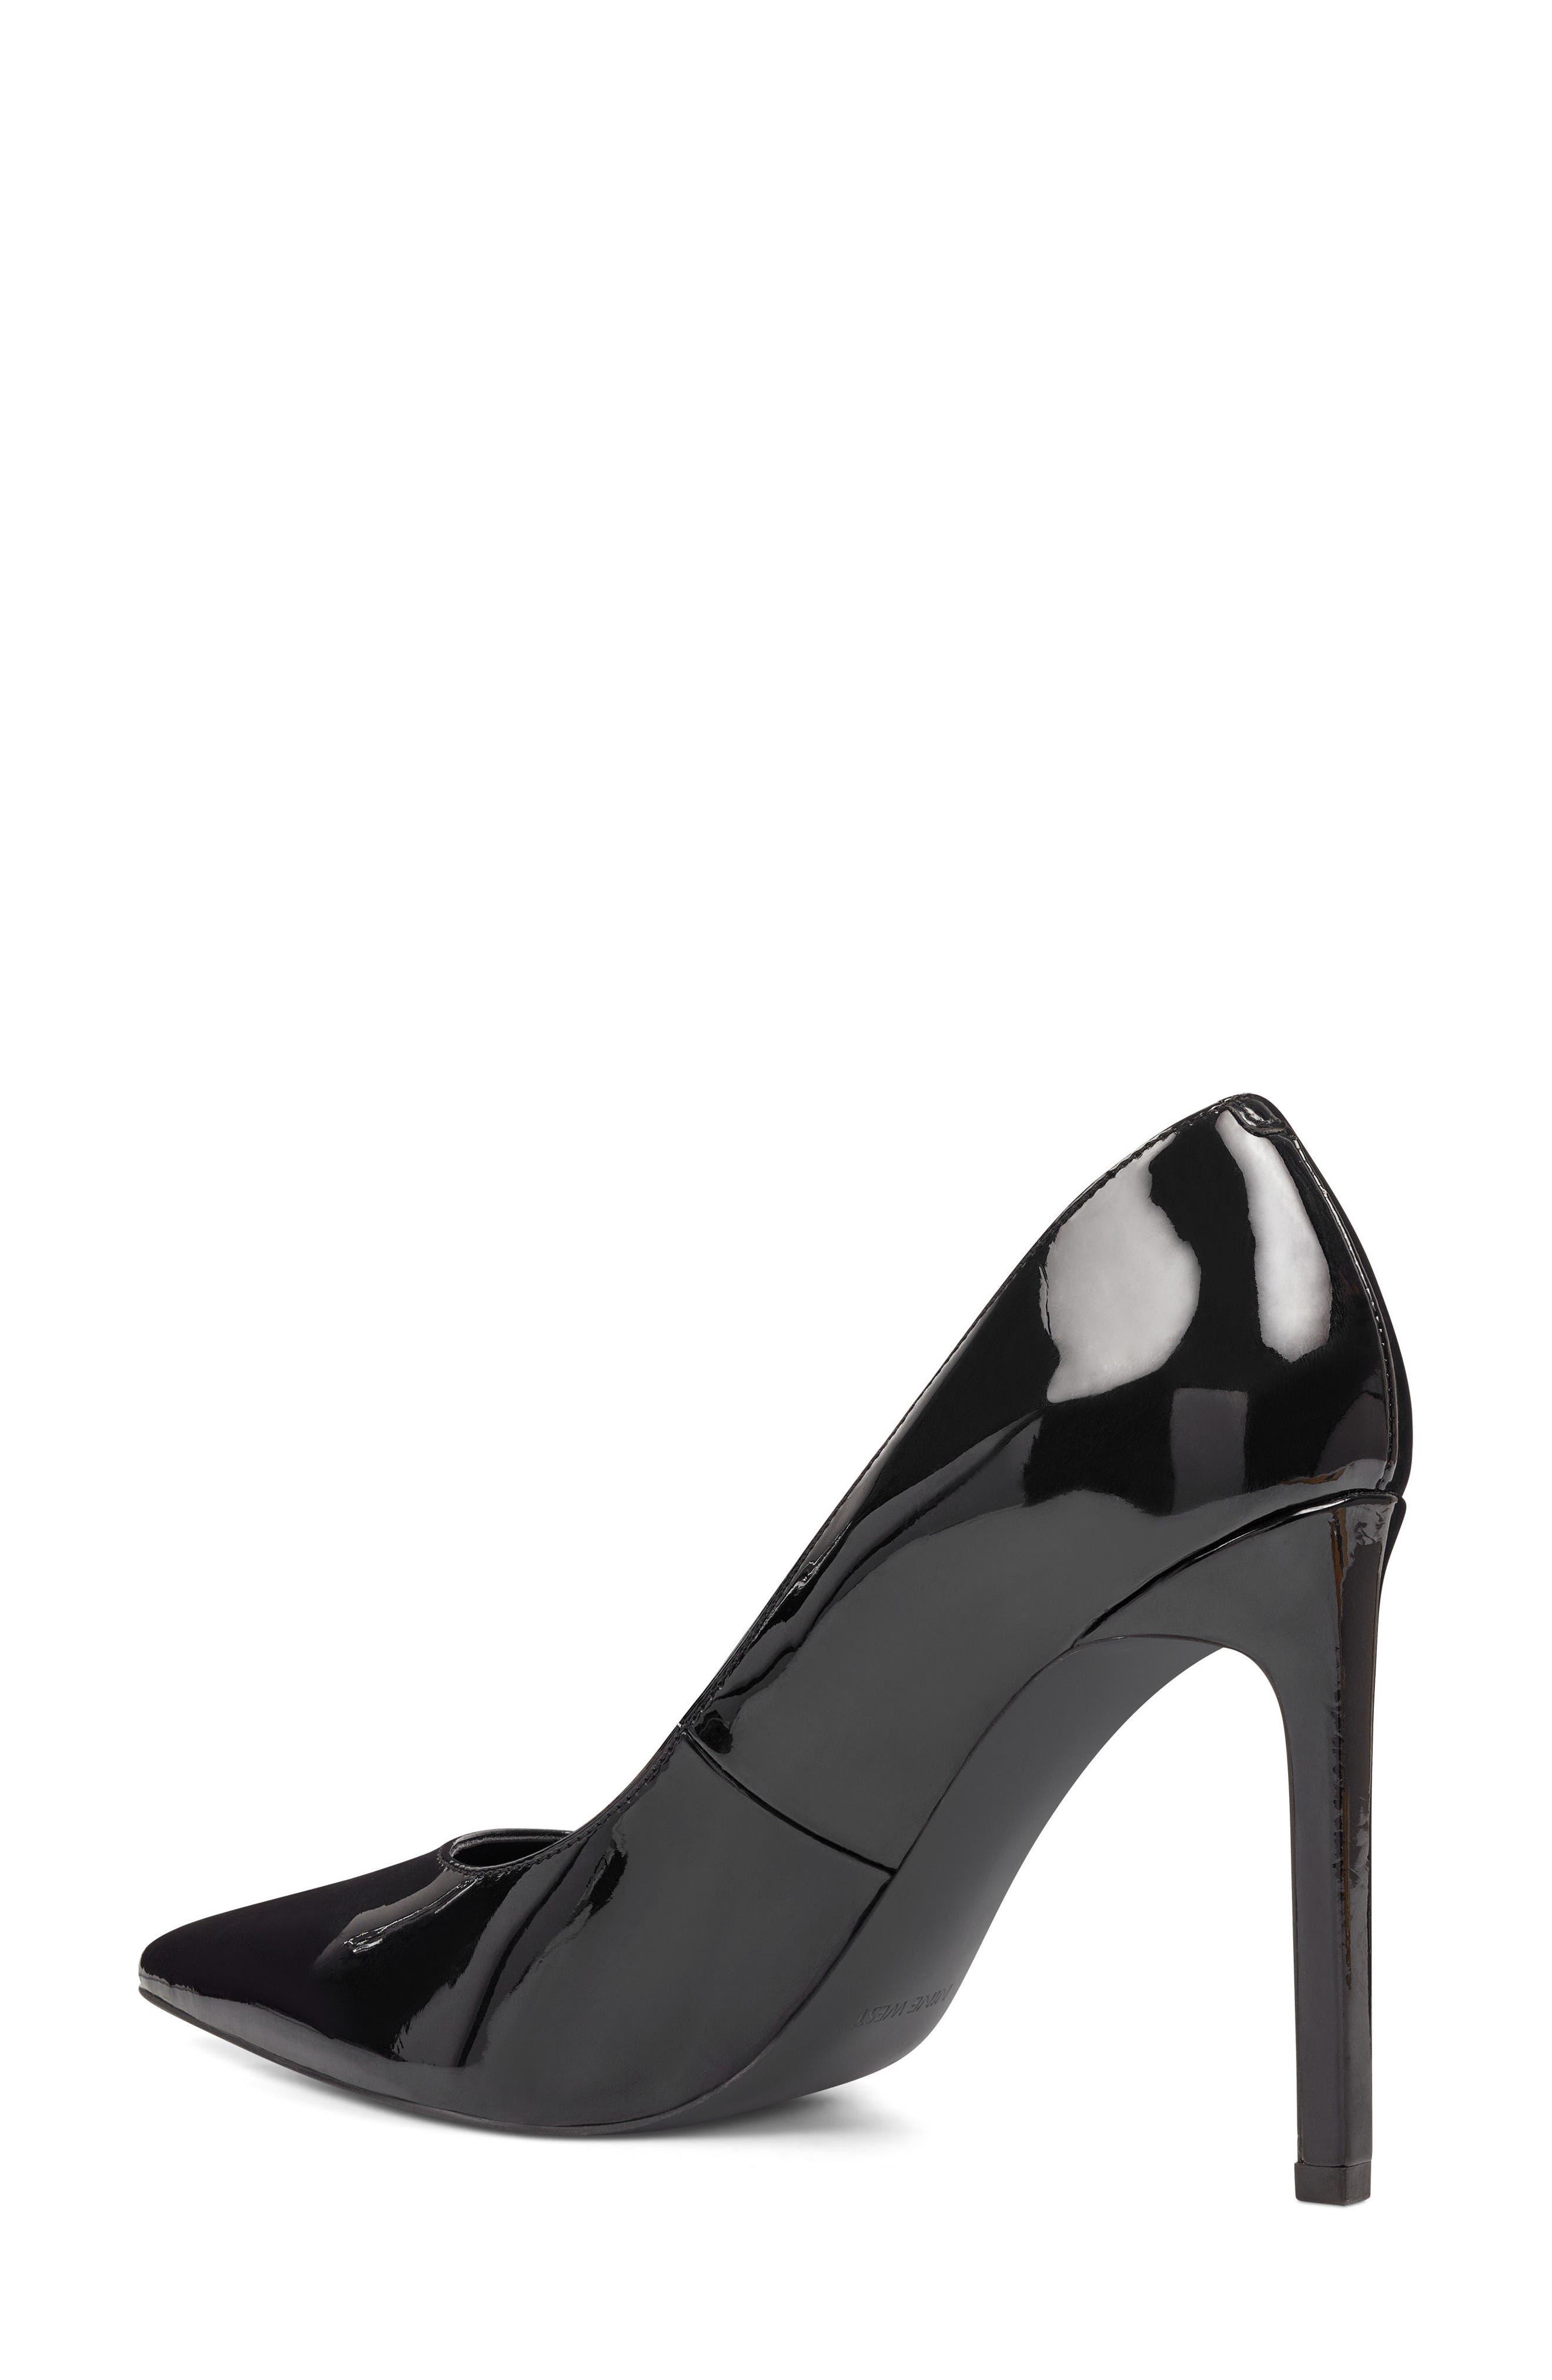 'Tatiana' Pointy Toe Pump,                             Alternate thumbnail 2, color,                             Black Sleek Patent